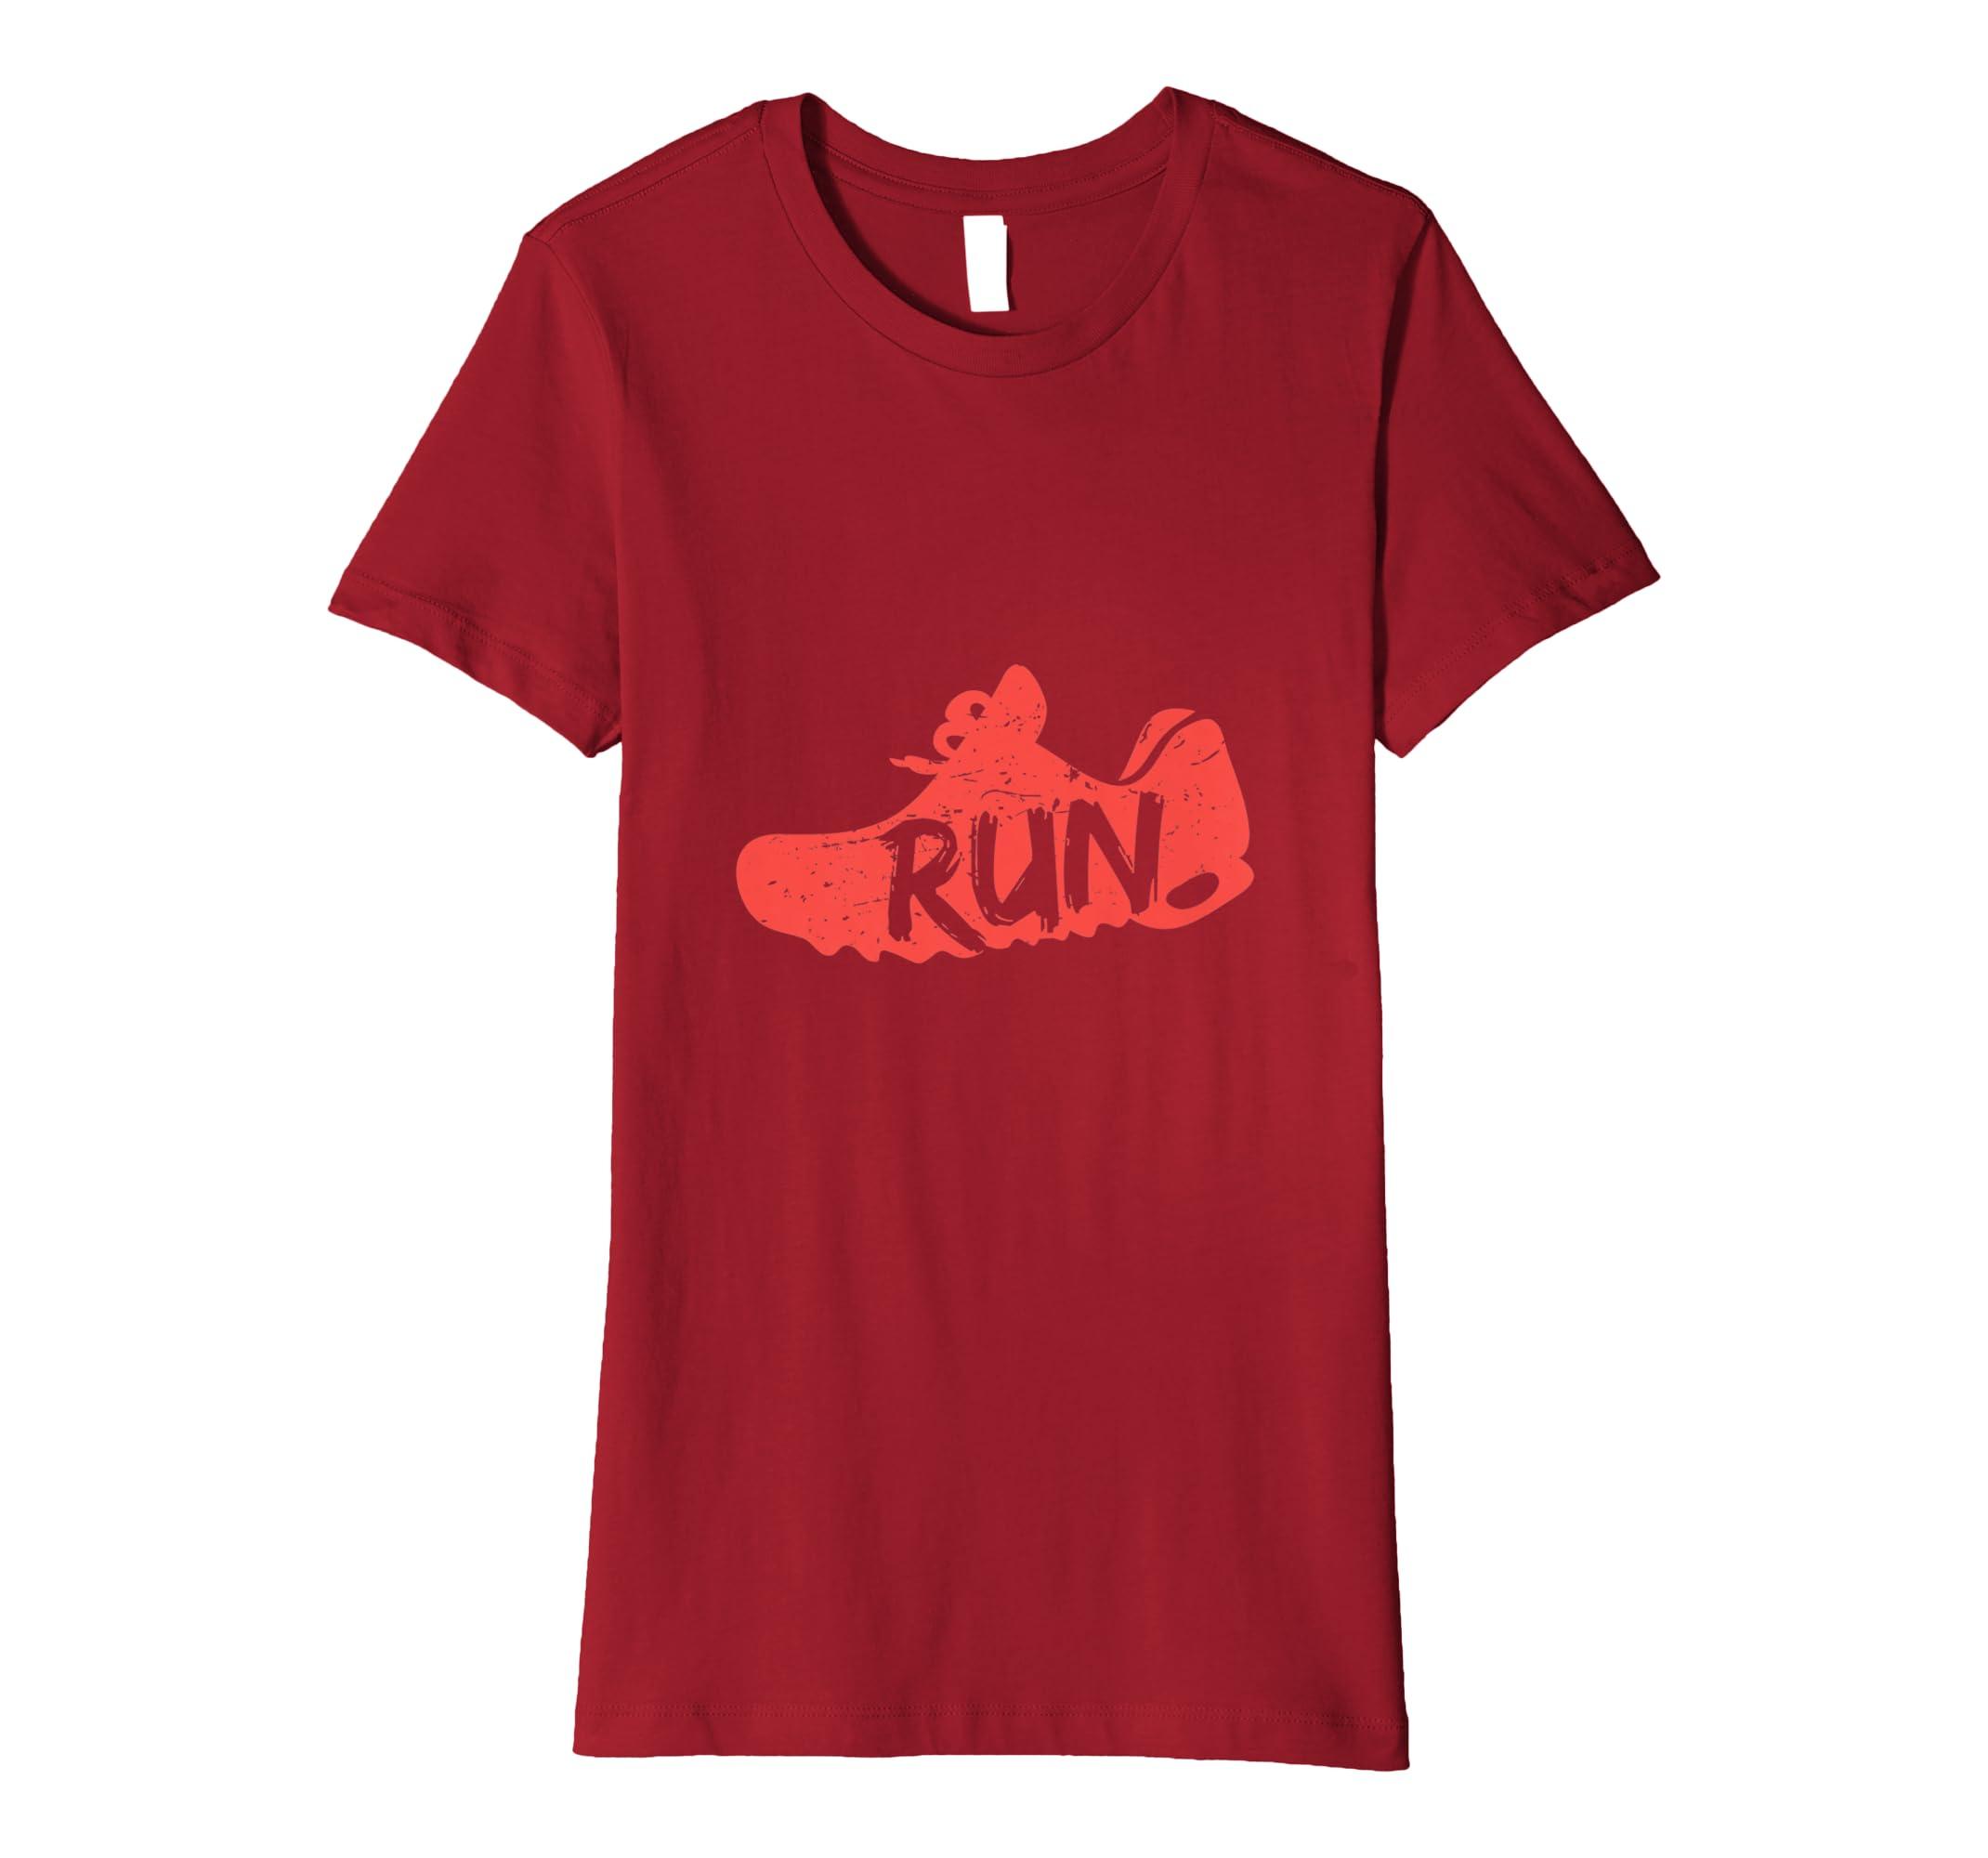 Sportschuhe laufen Läufer Geschenk Fun T Shirt: Amazon.de: Bekleidung